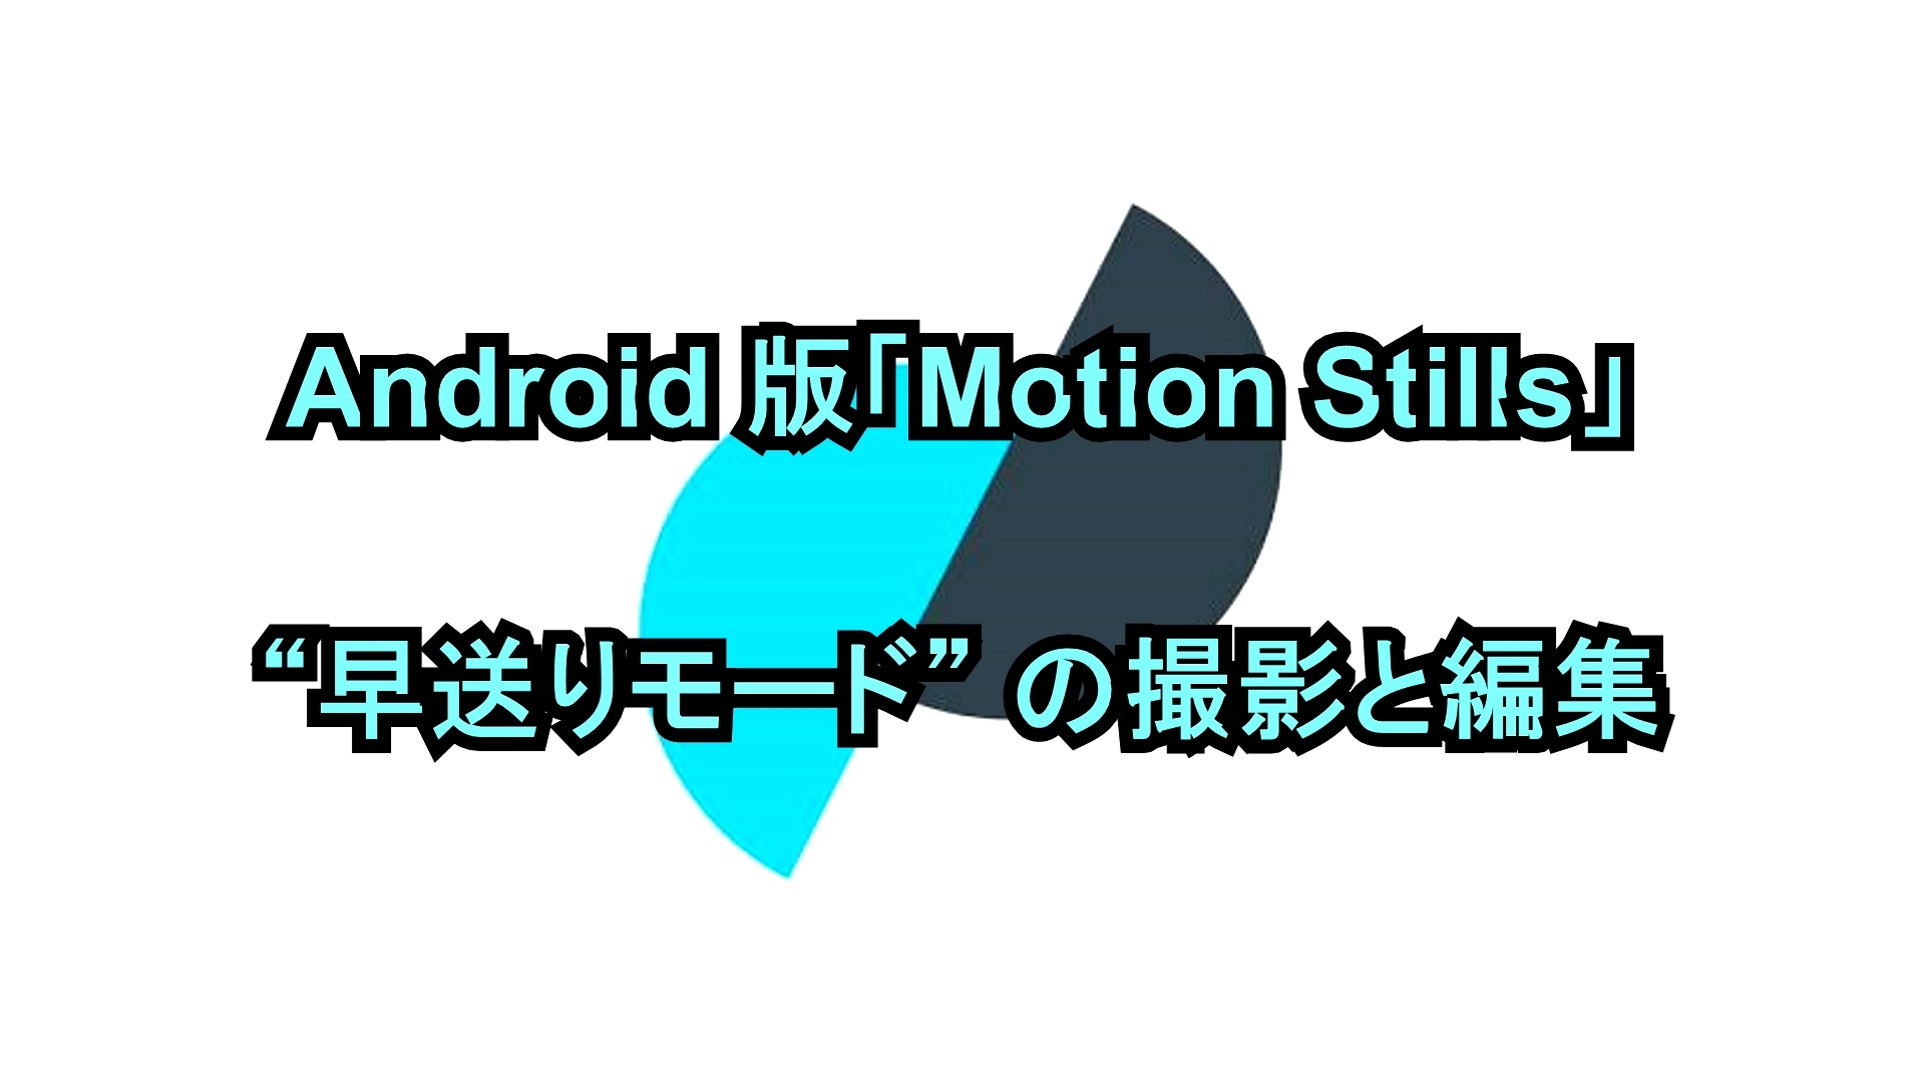 "Android版「Motion Stills」""早送りモード""の撮影と編集"